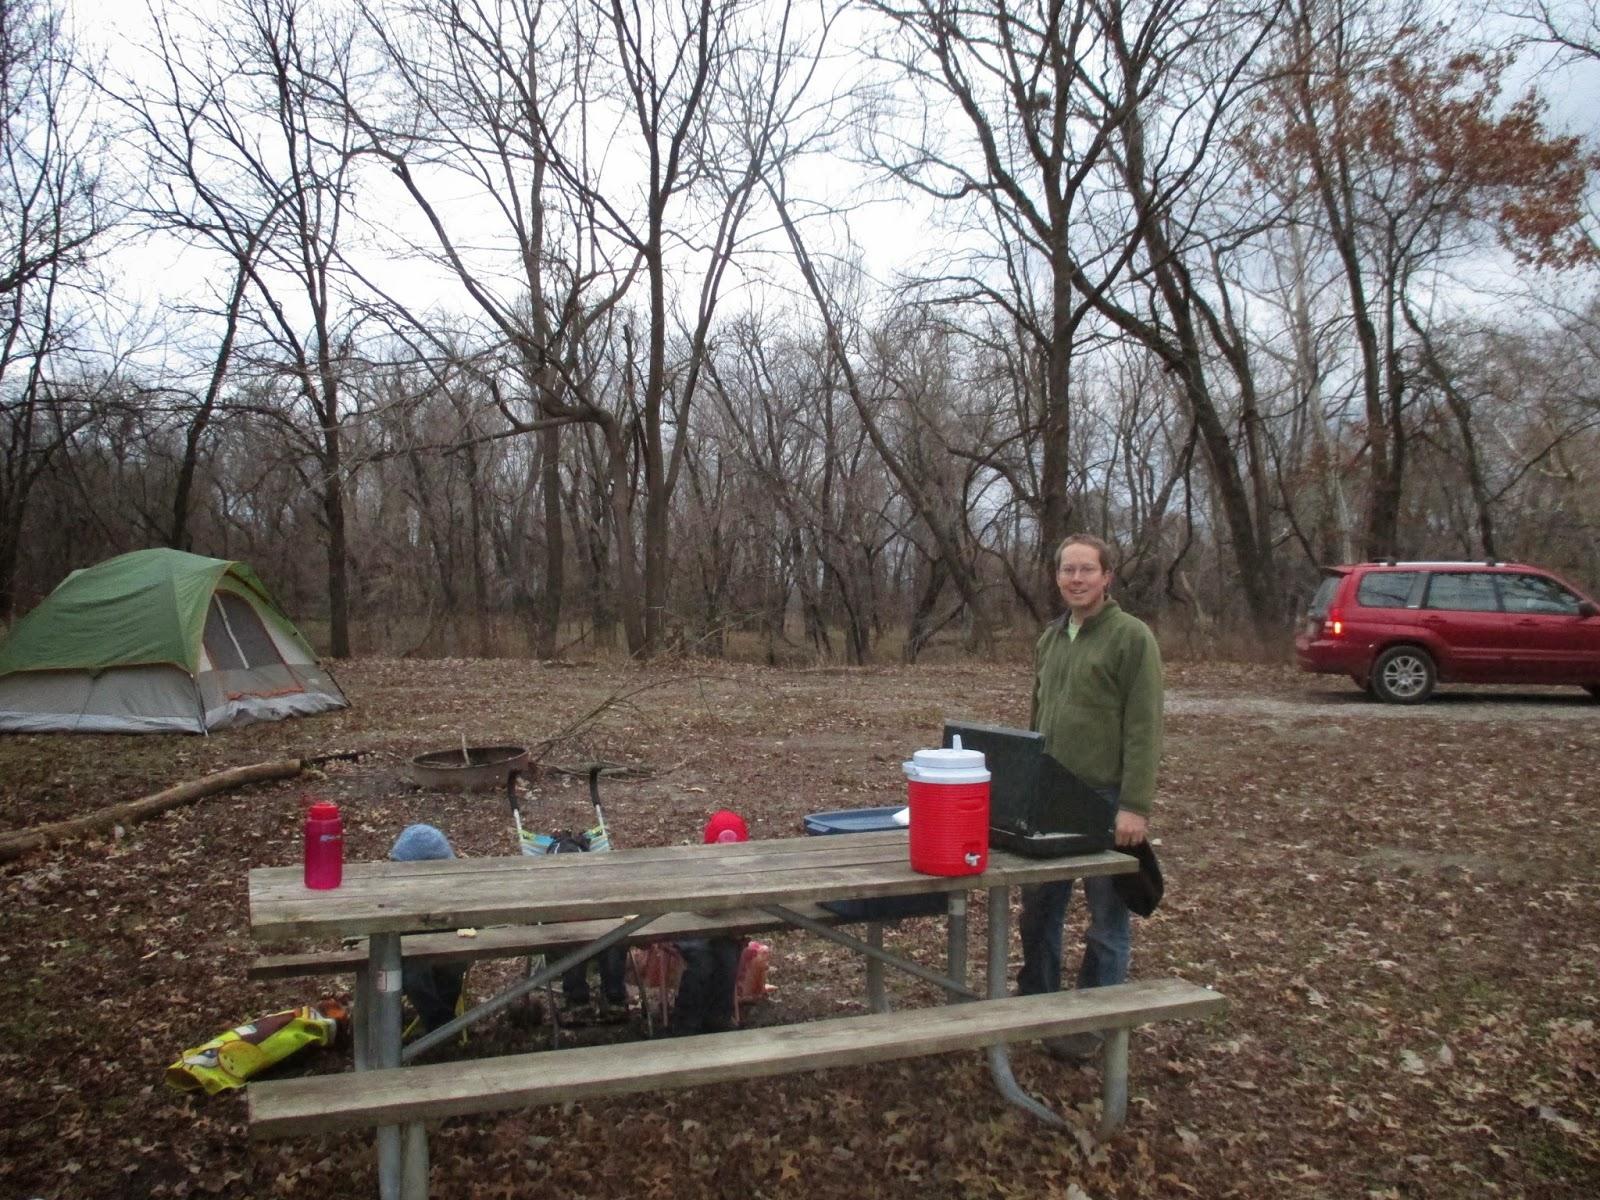 backyard excursions camping at marais des cygnes